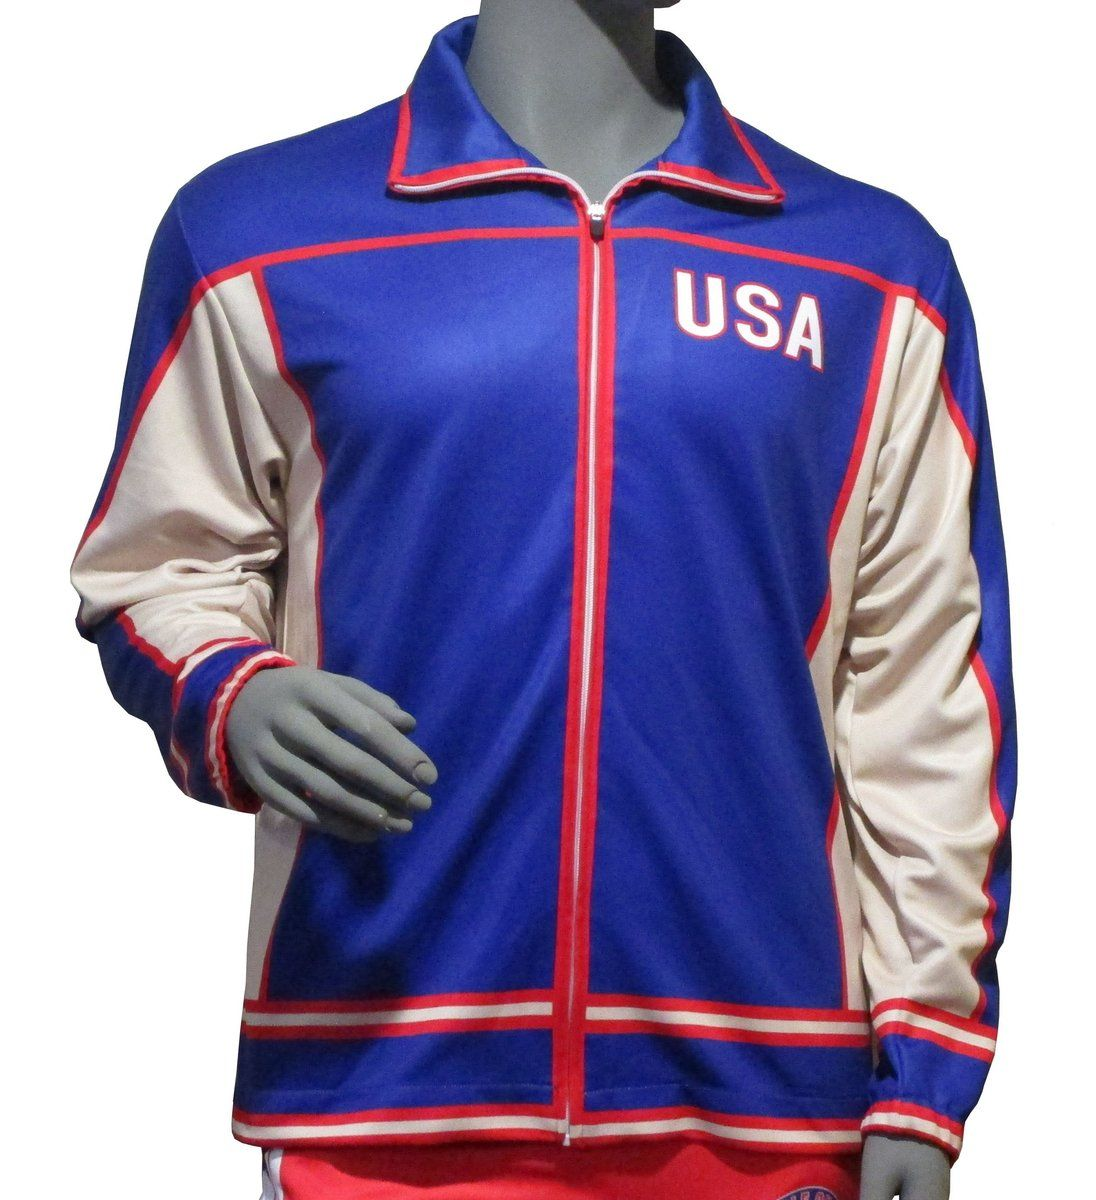 Commemorates The 1980 Miracle On Ice Hockey Team Ae High Quality Performance Fabric Ae Stylish Fashionable Great Gift Idea For Hockey F Usa Hockey Hockey Fans